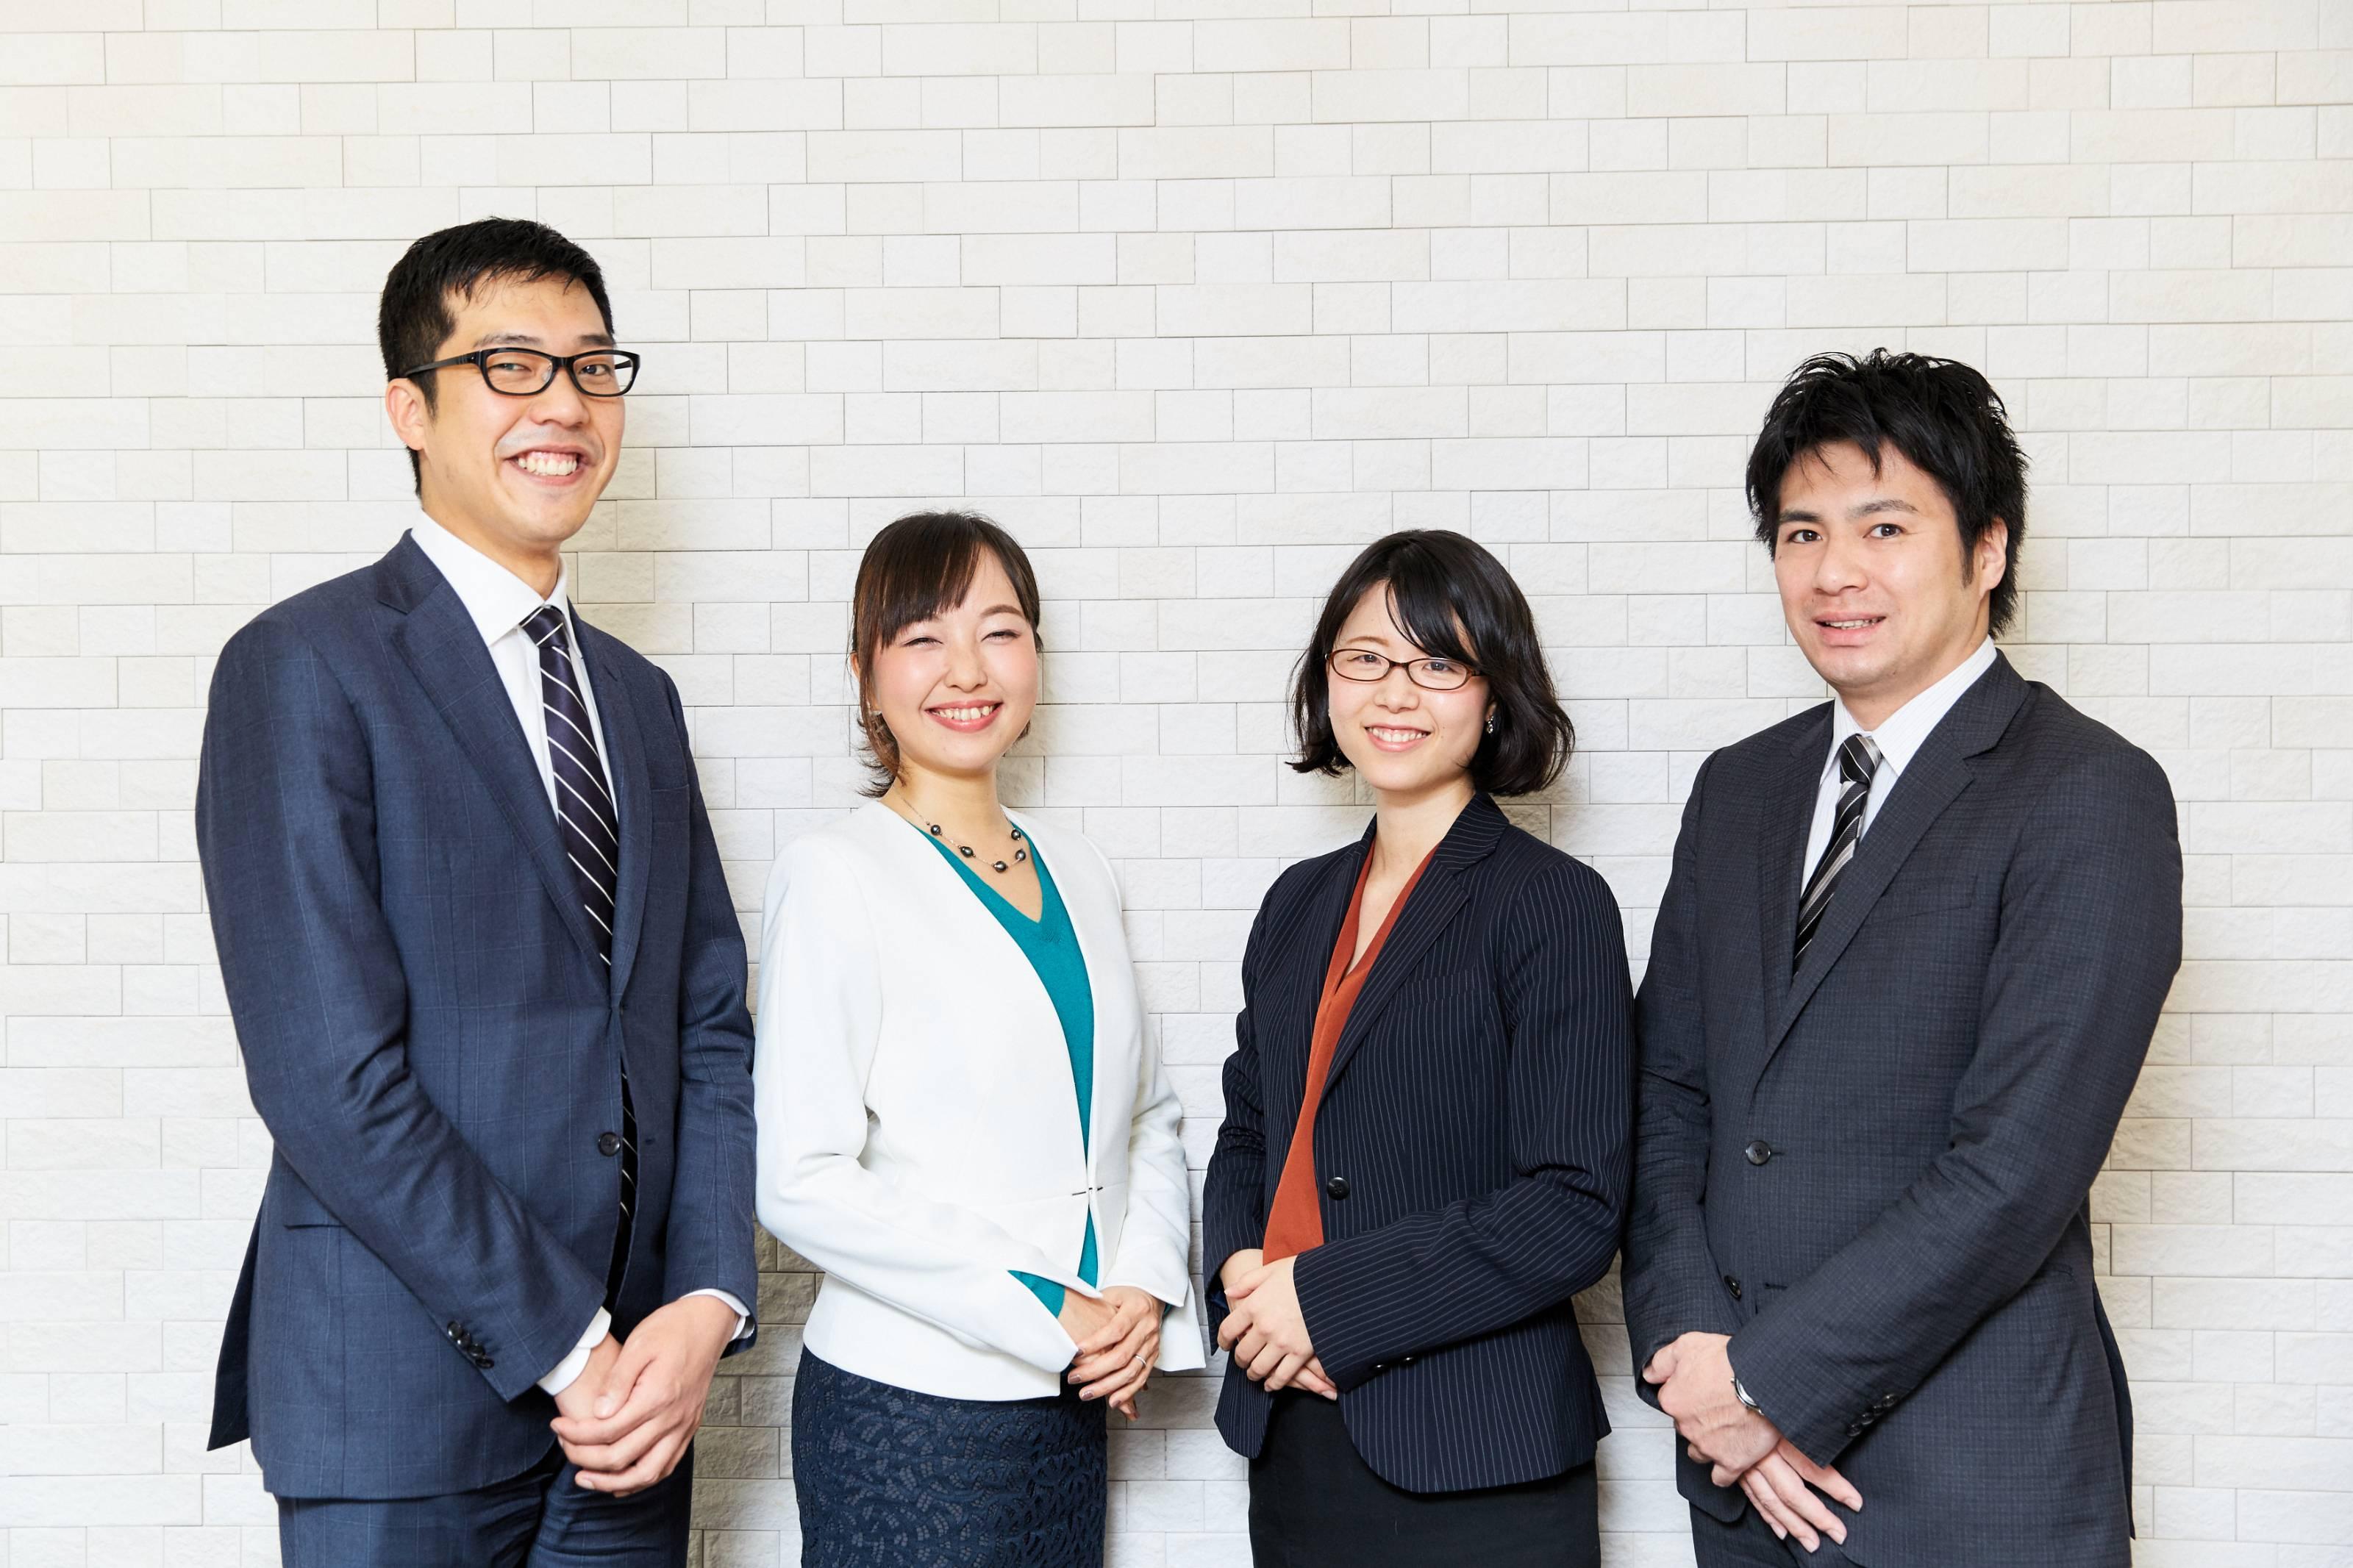 弁護士法人戸田総合法律事務所(博多オフィス)